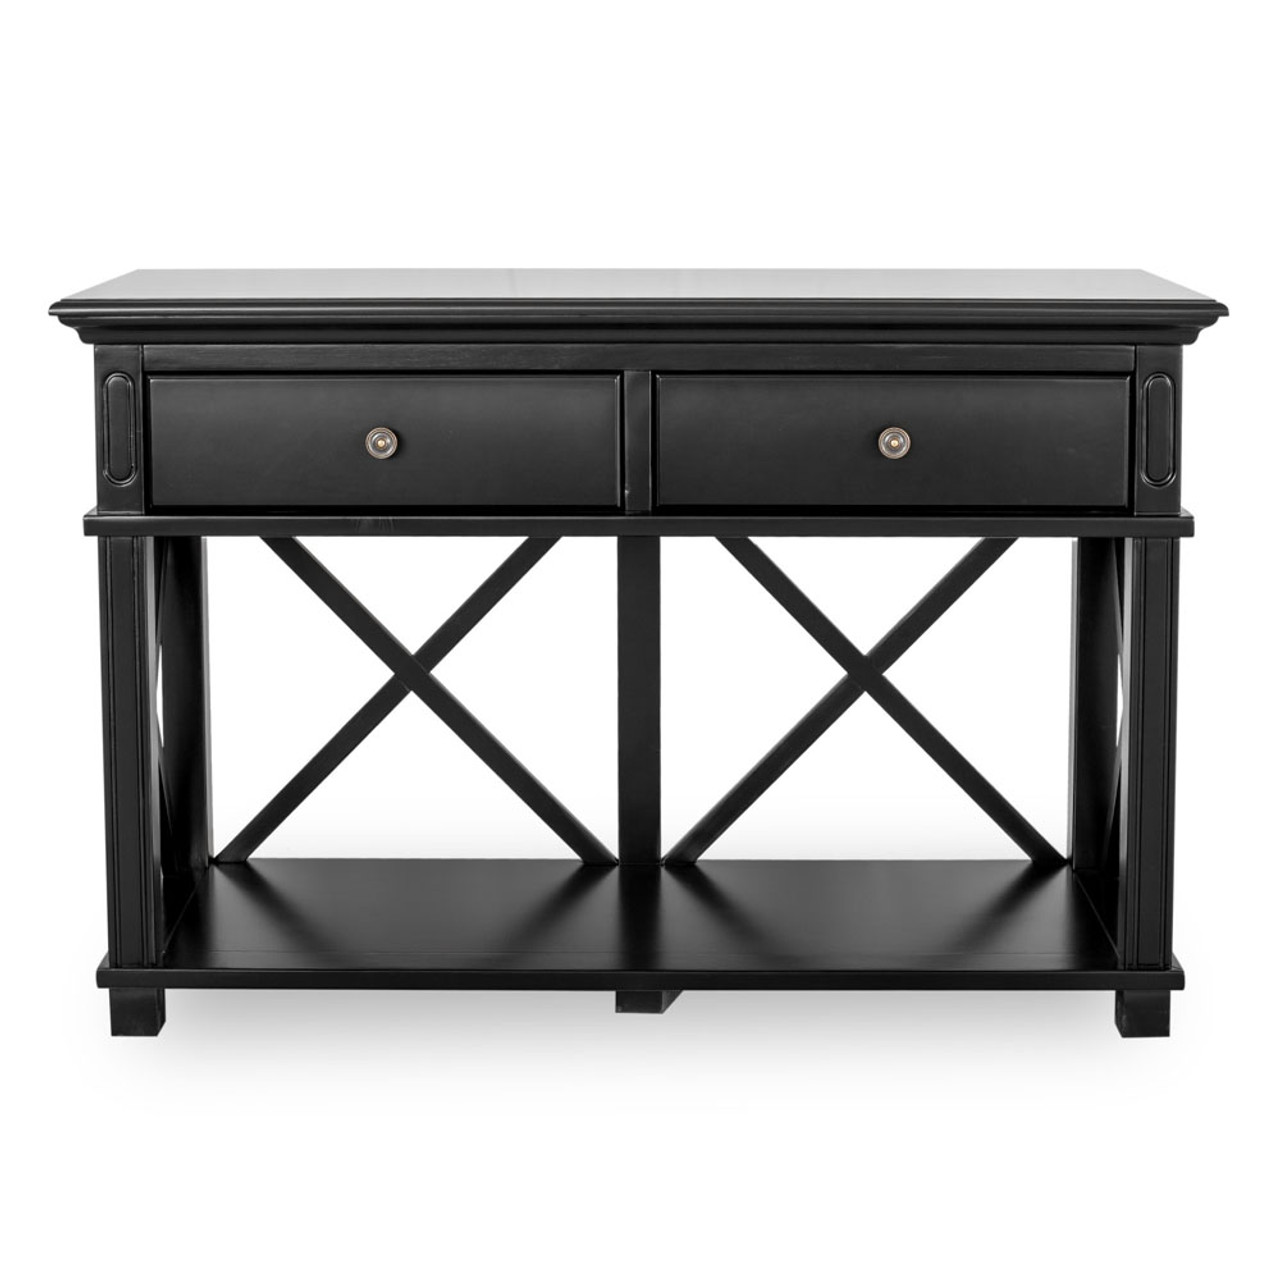 Hamptons Cross Console Table 2 Drawer Black